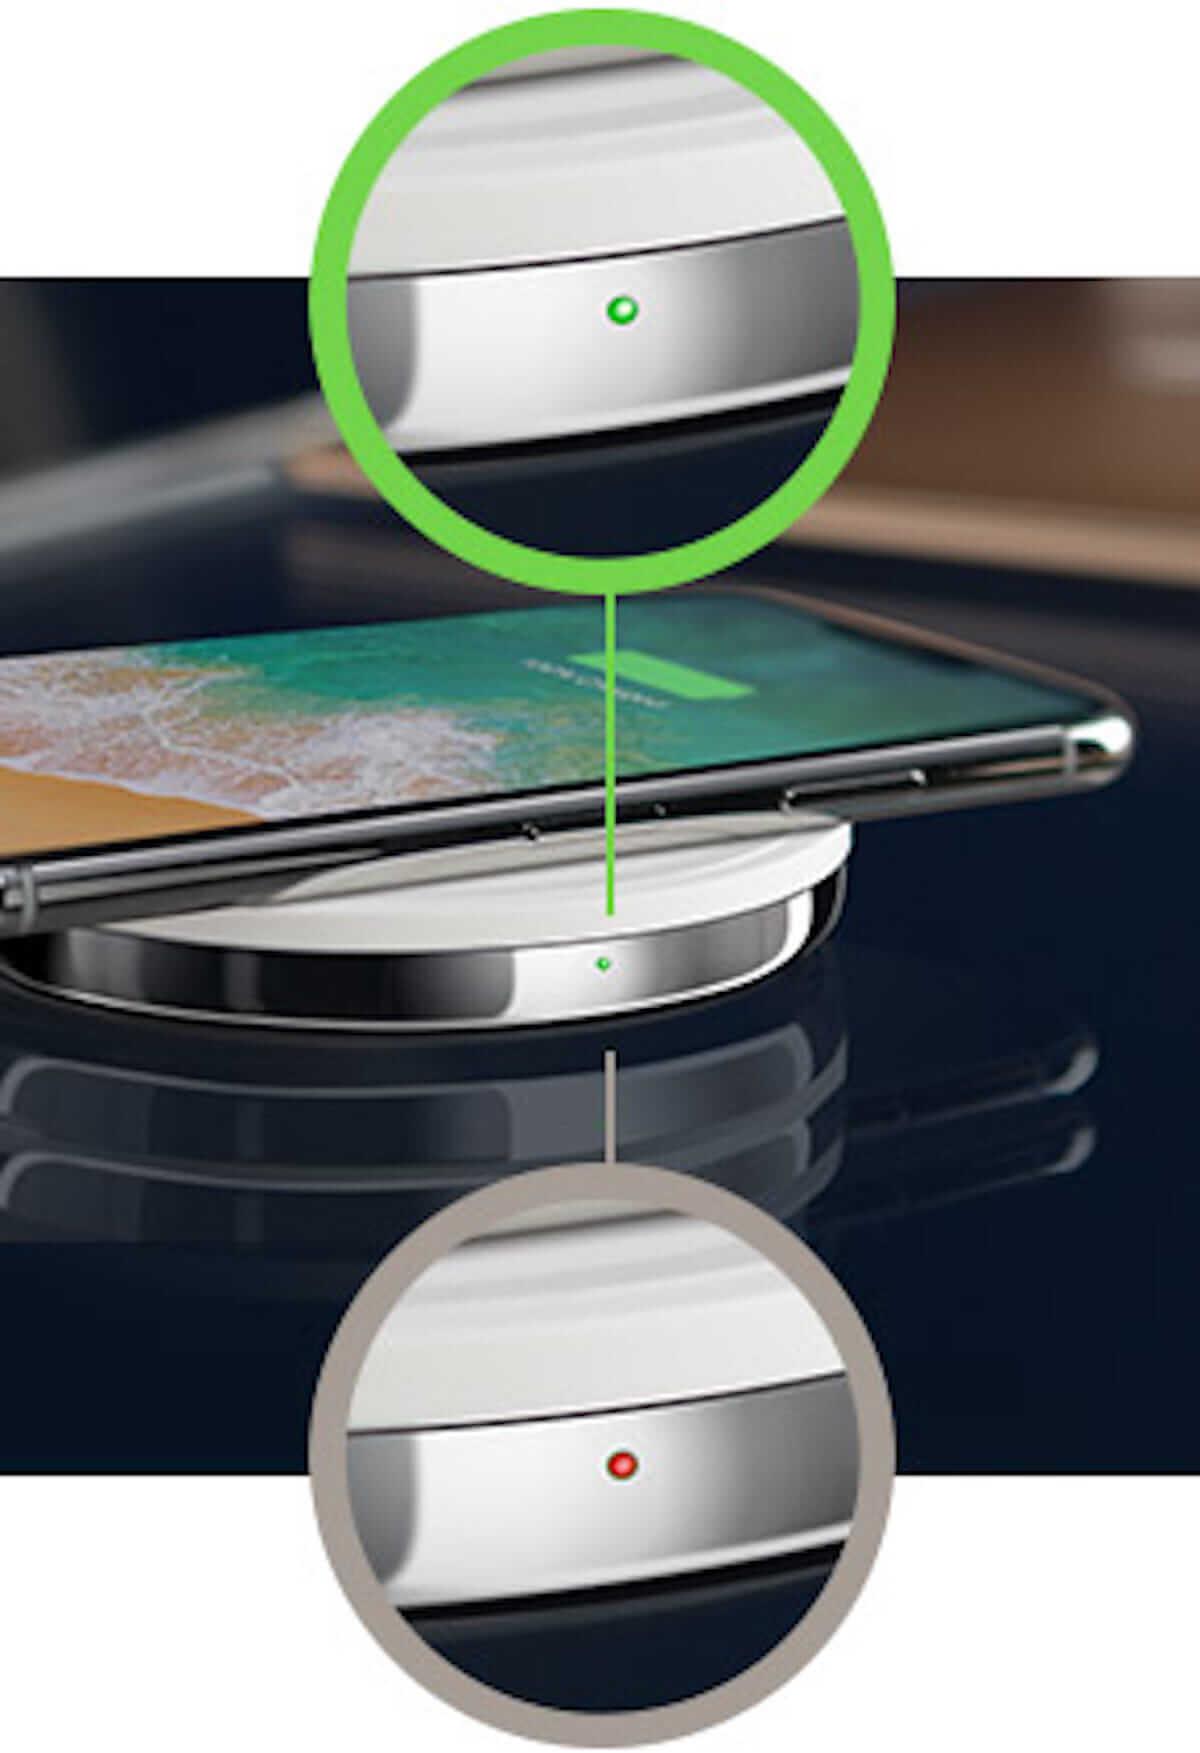 BelkinからApple Store限定ワイヤレス充電器登場!ところで、AirPowerはいつ発売?? technology180618_belkin_3-1200x1753